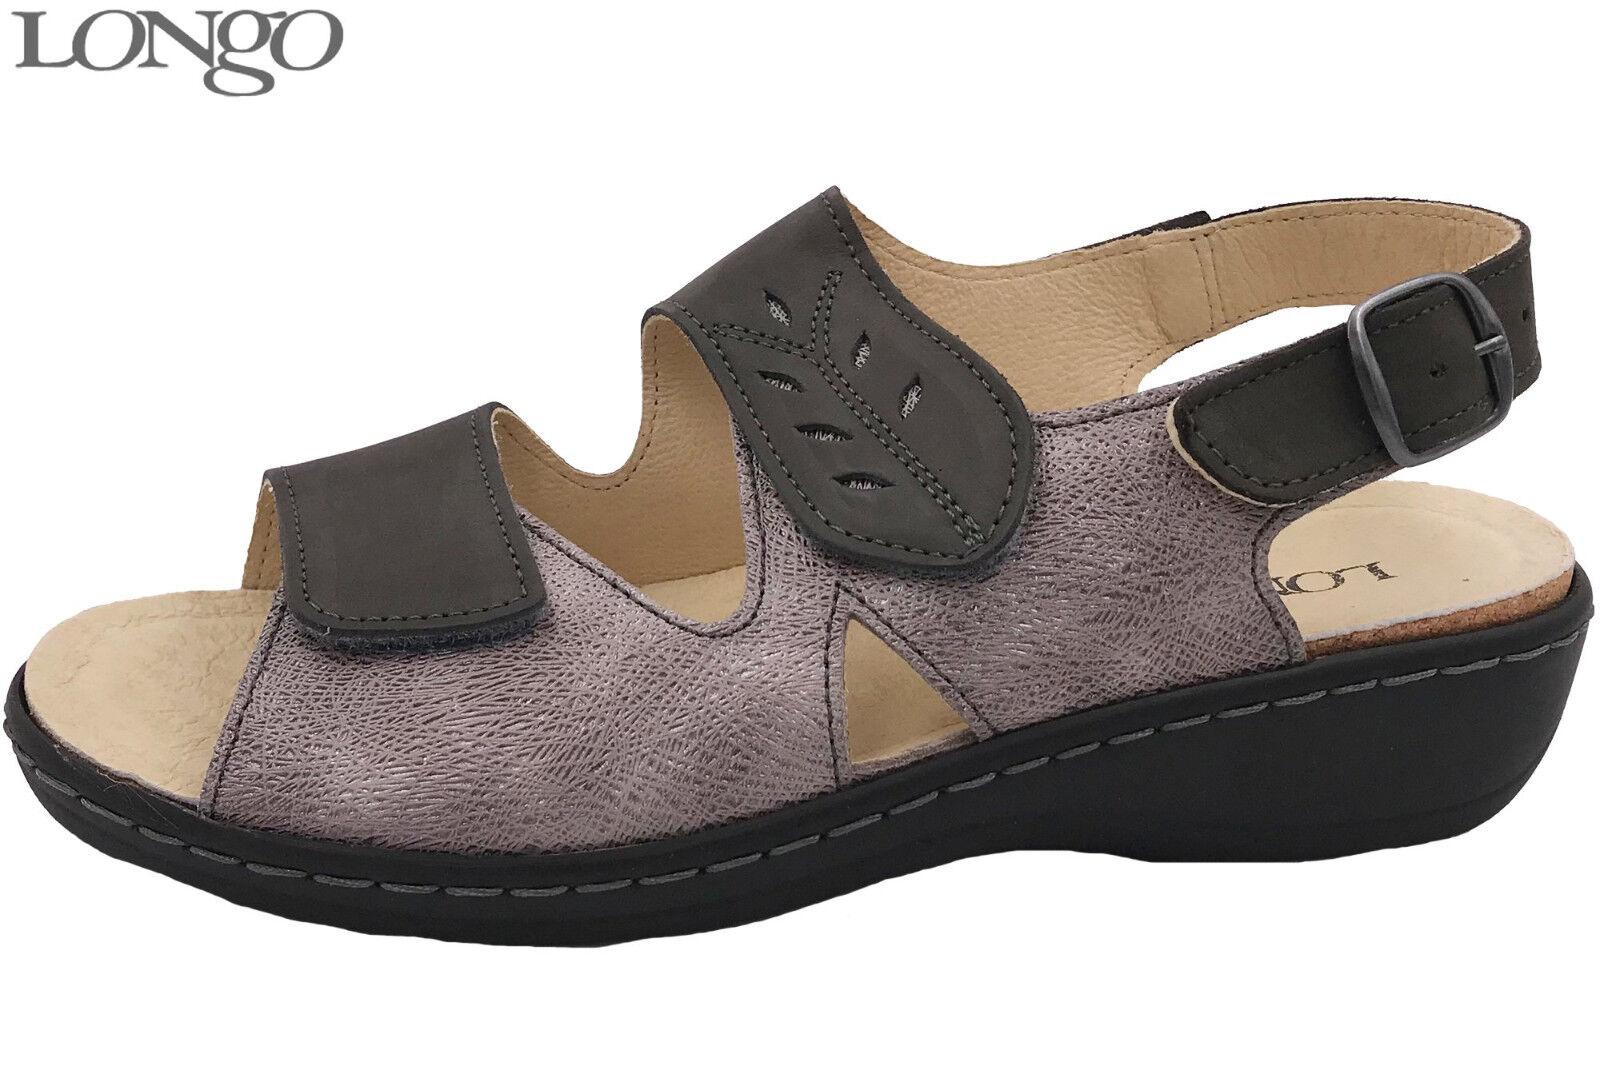 Longo Damen Sandale Grau Taupe Leder lose Einlage Sommer Schuh 1006419 NEU